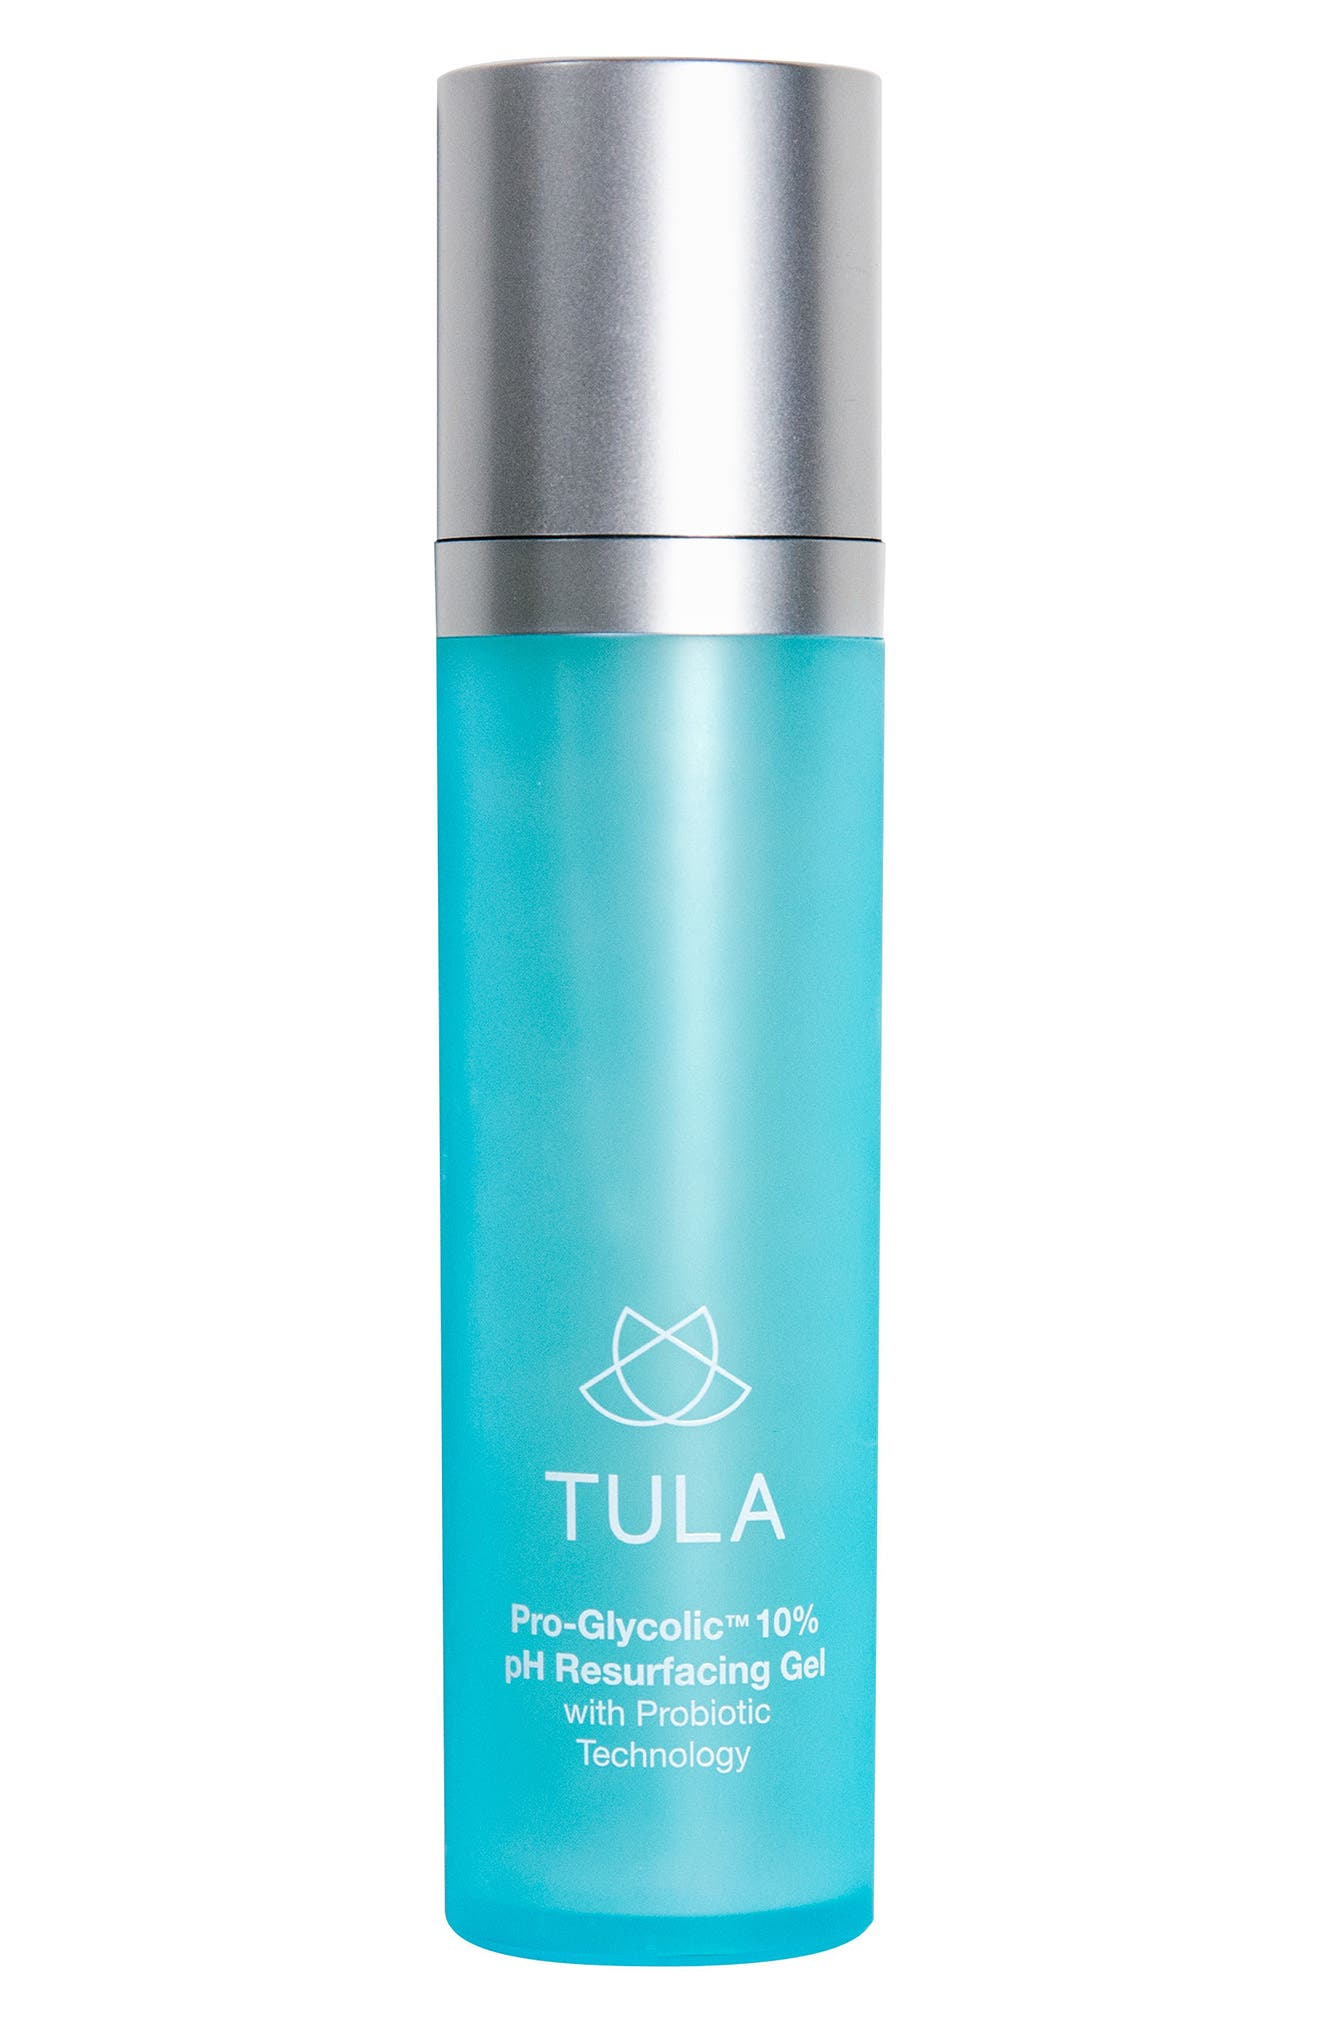 Alternate Image 1 Selected - Tula Probiotic Skincare Pro-Glycolic™ 10% pH Resurfacing Gel